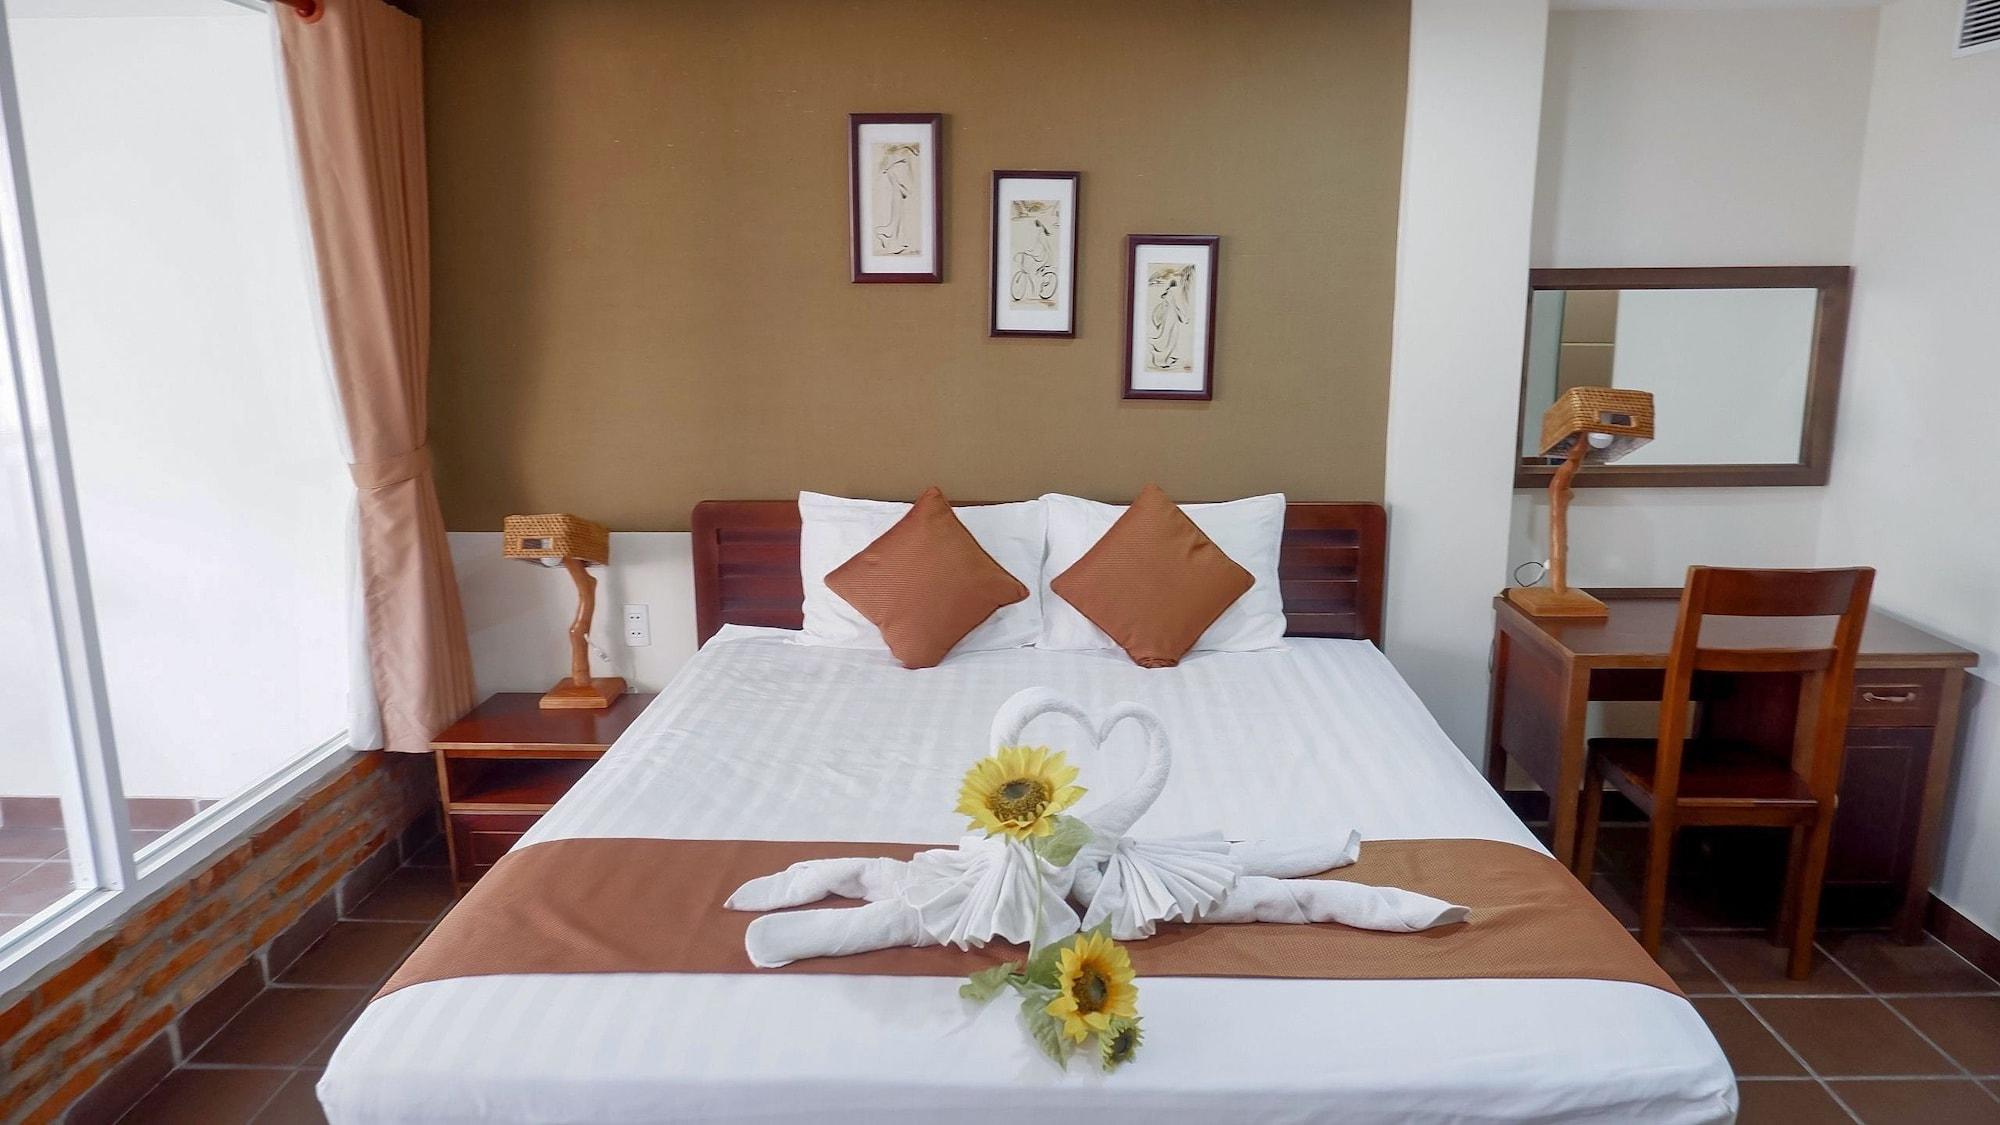 Ananas Family Hotel, Phú Nhuận